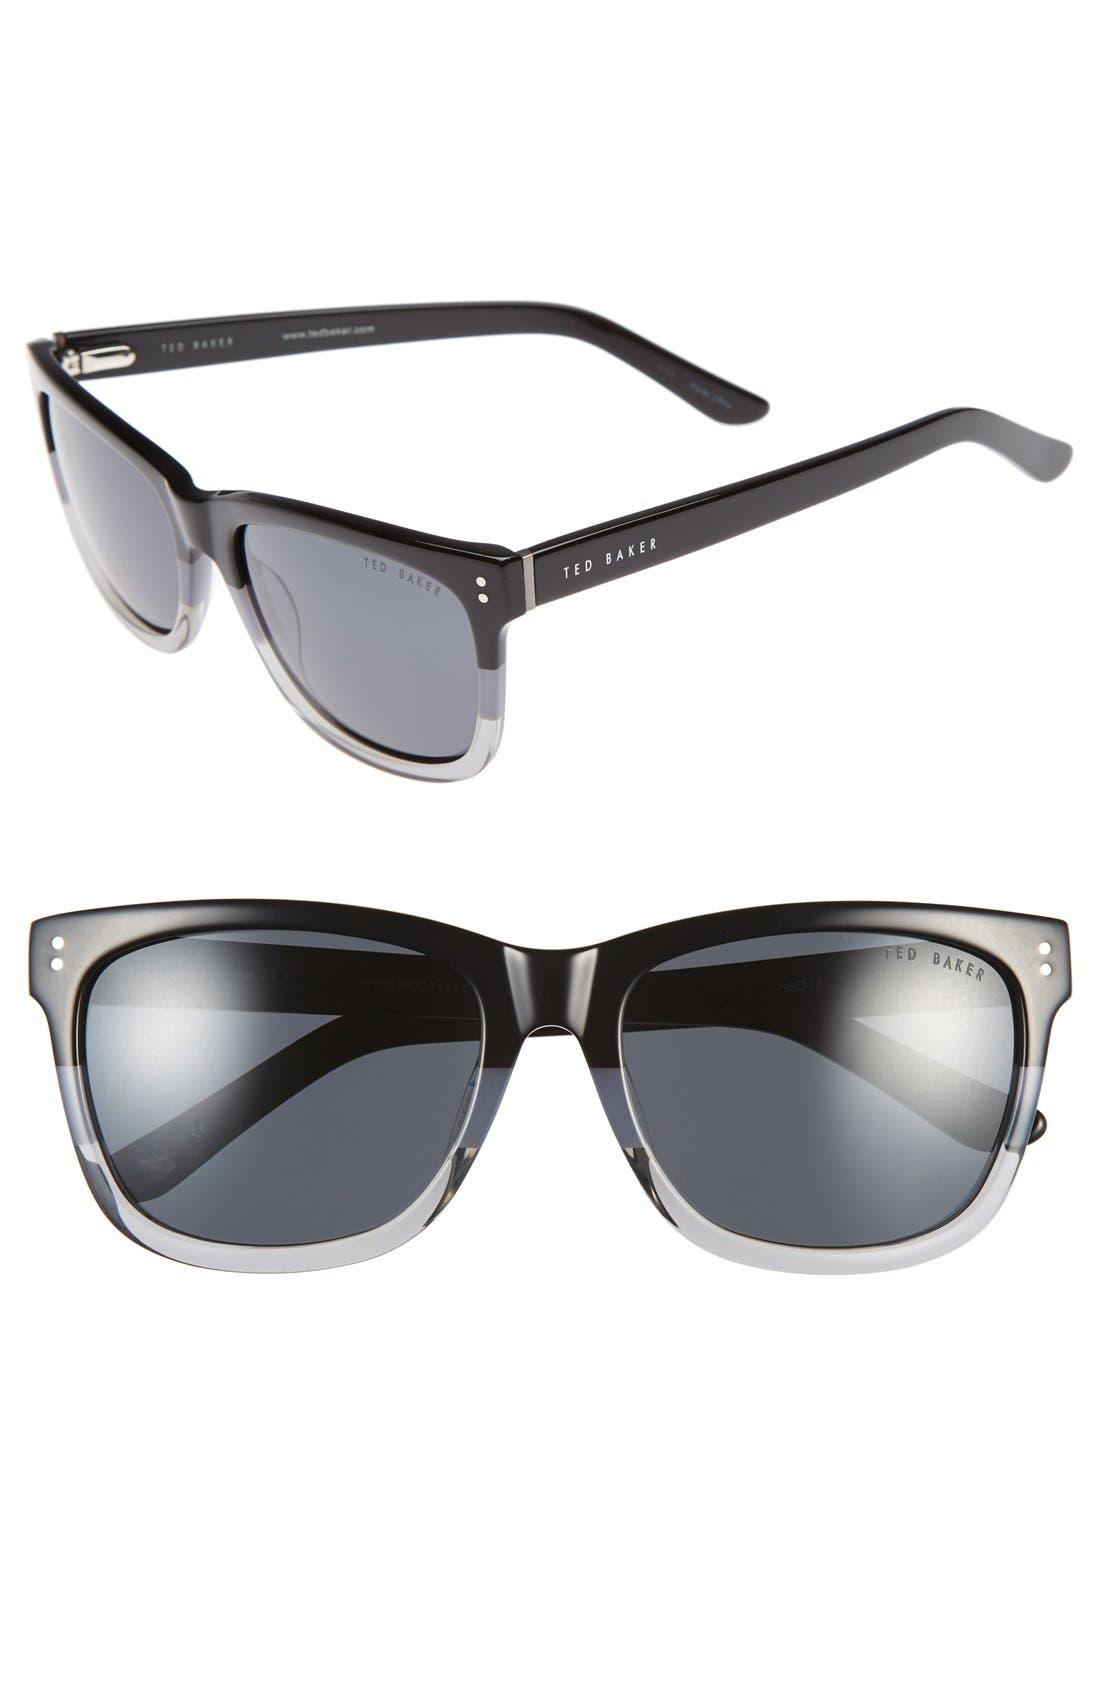 Alternate Image 1 Selected - Ted Baker London 56mm Polarized Retro Sunglasses